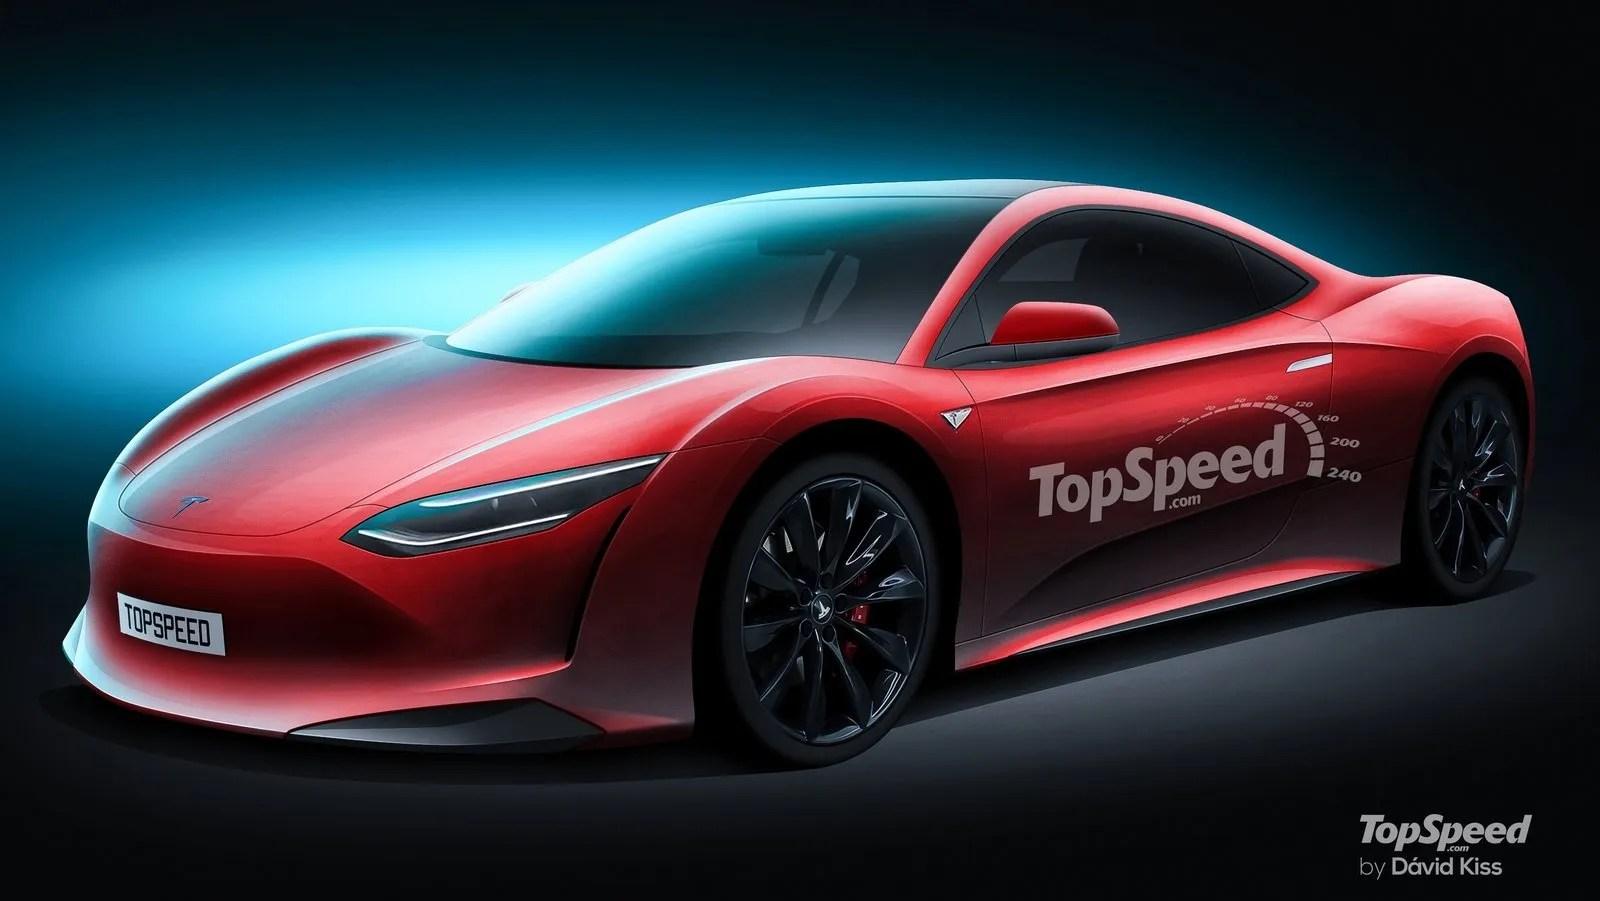 2020 Tesla Supercar Top Speed